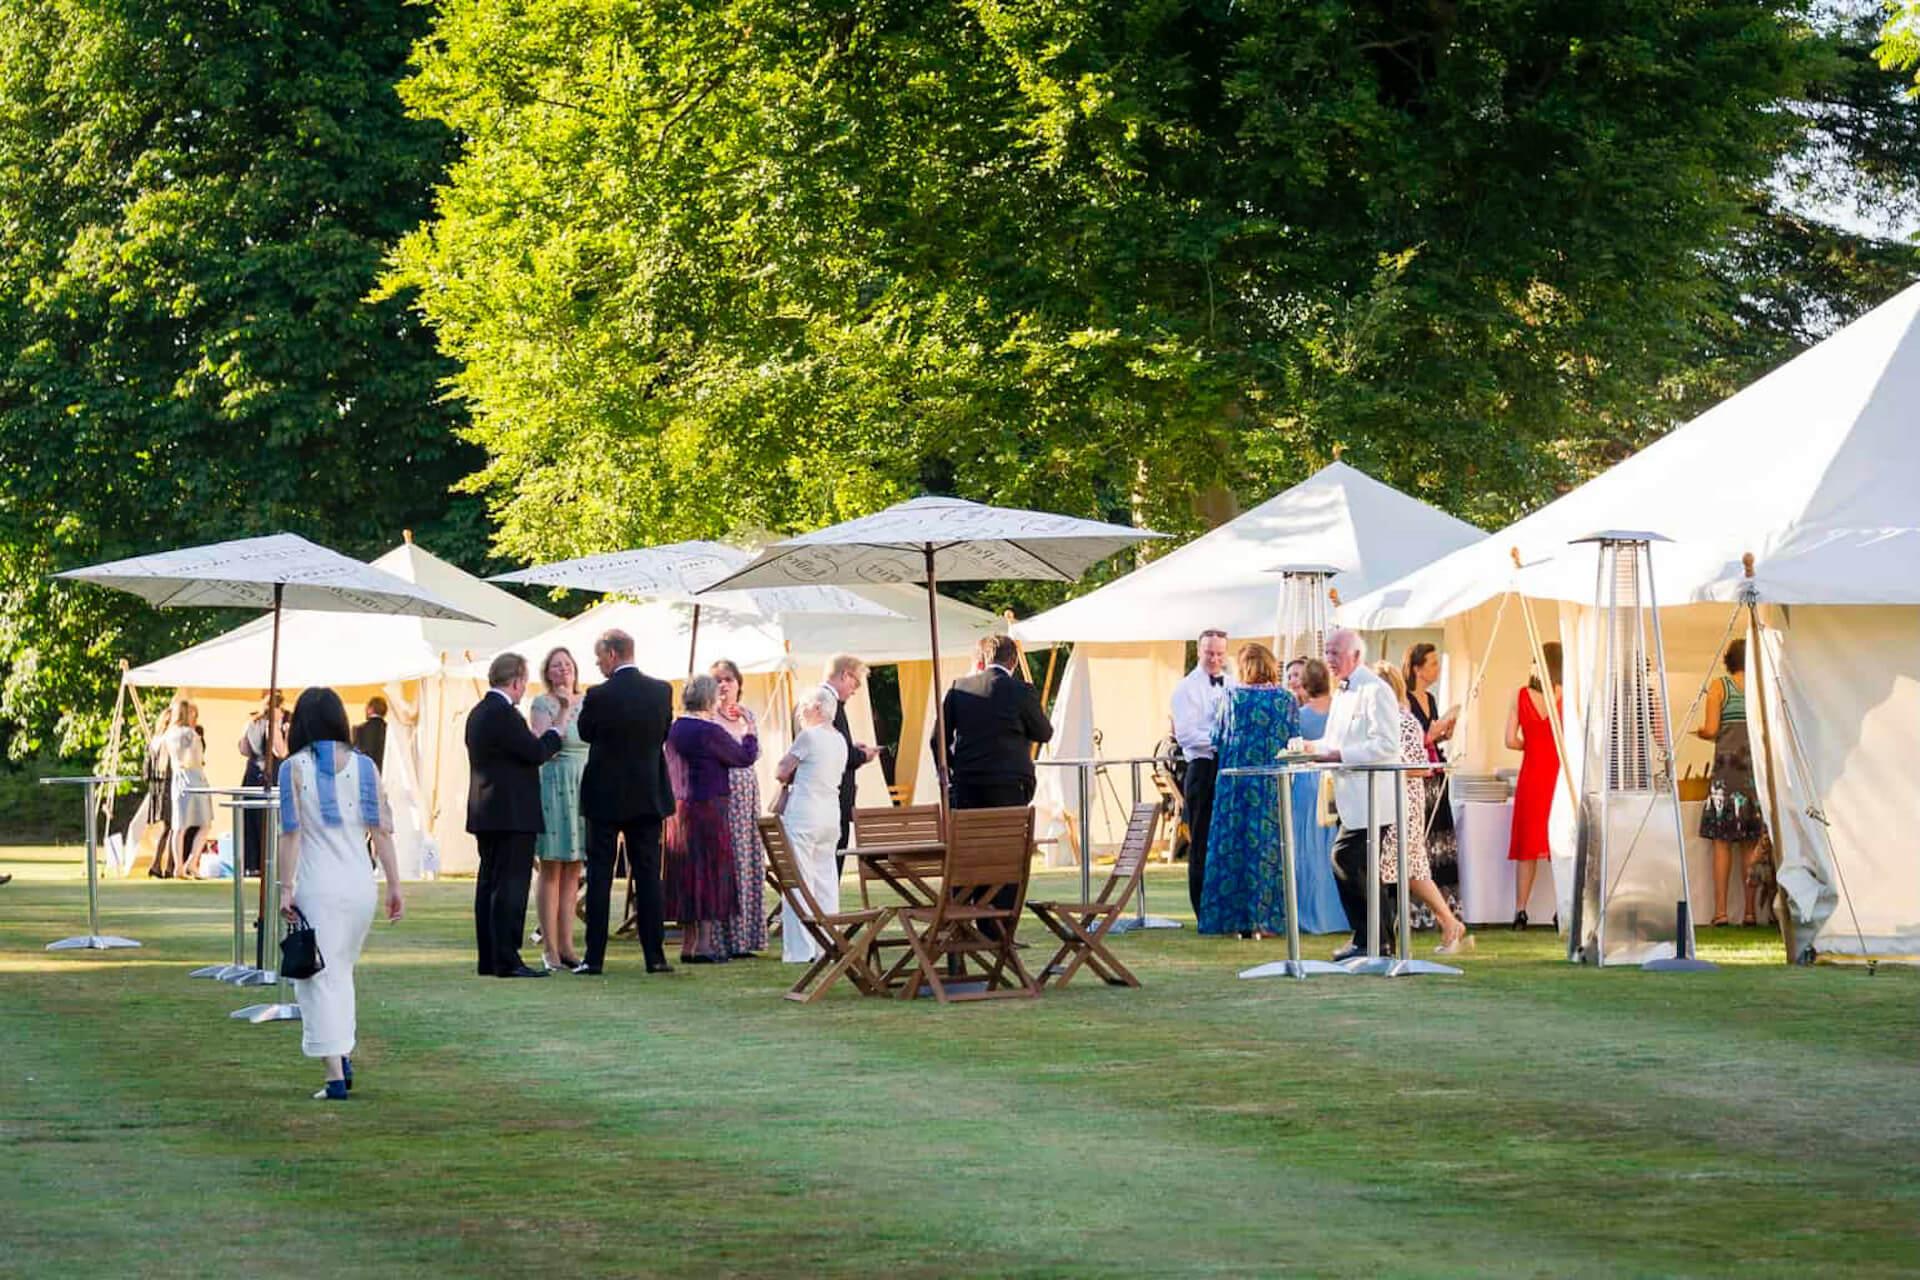 Garden opera picnic tents